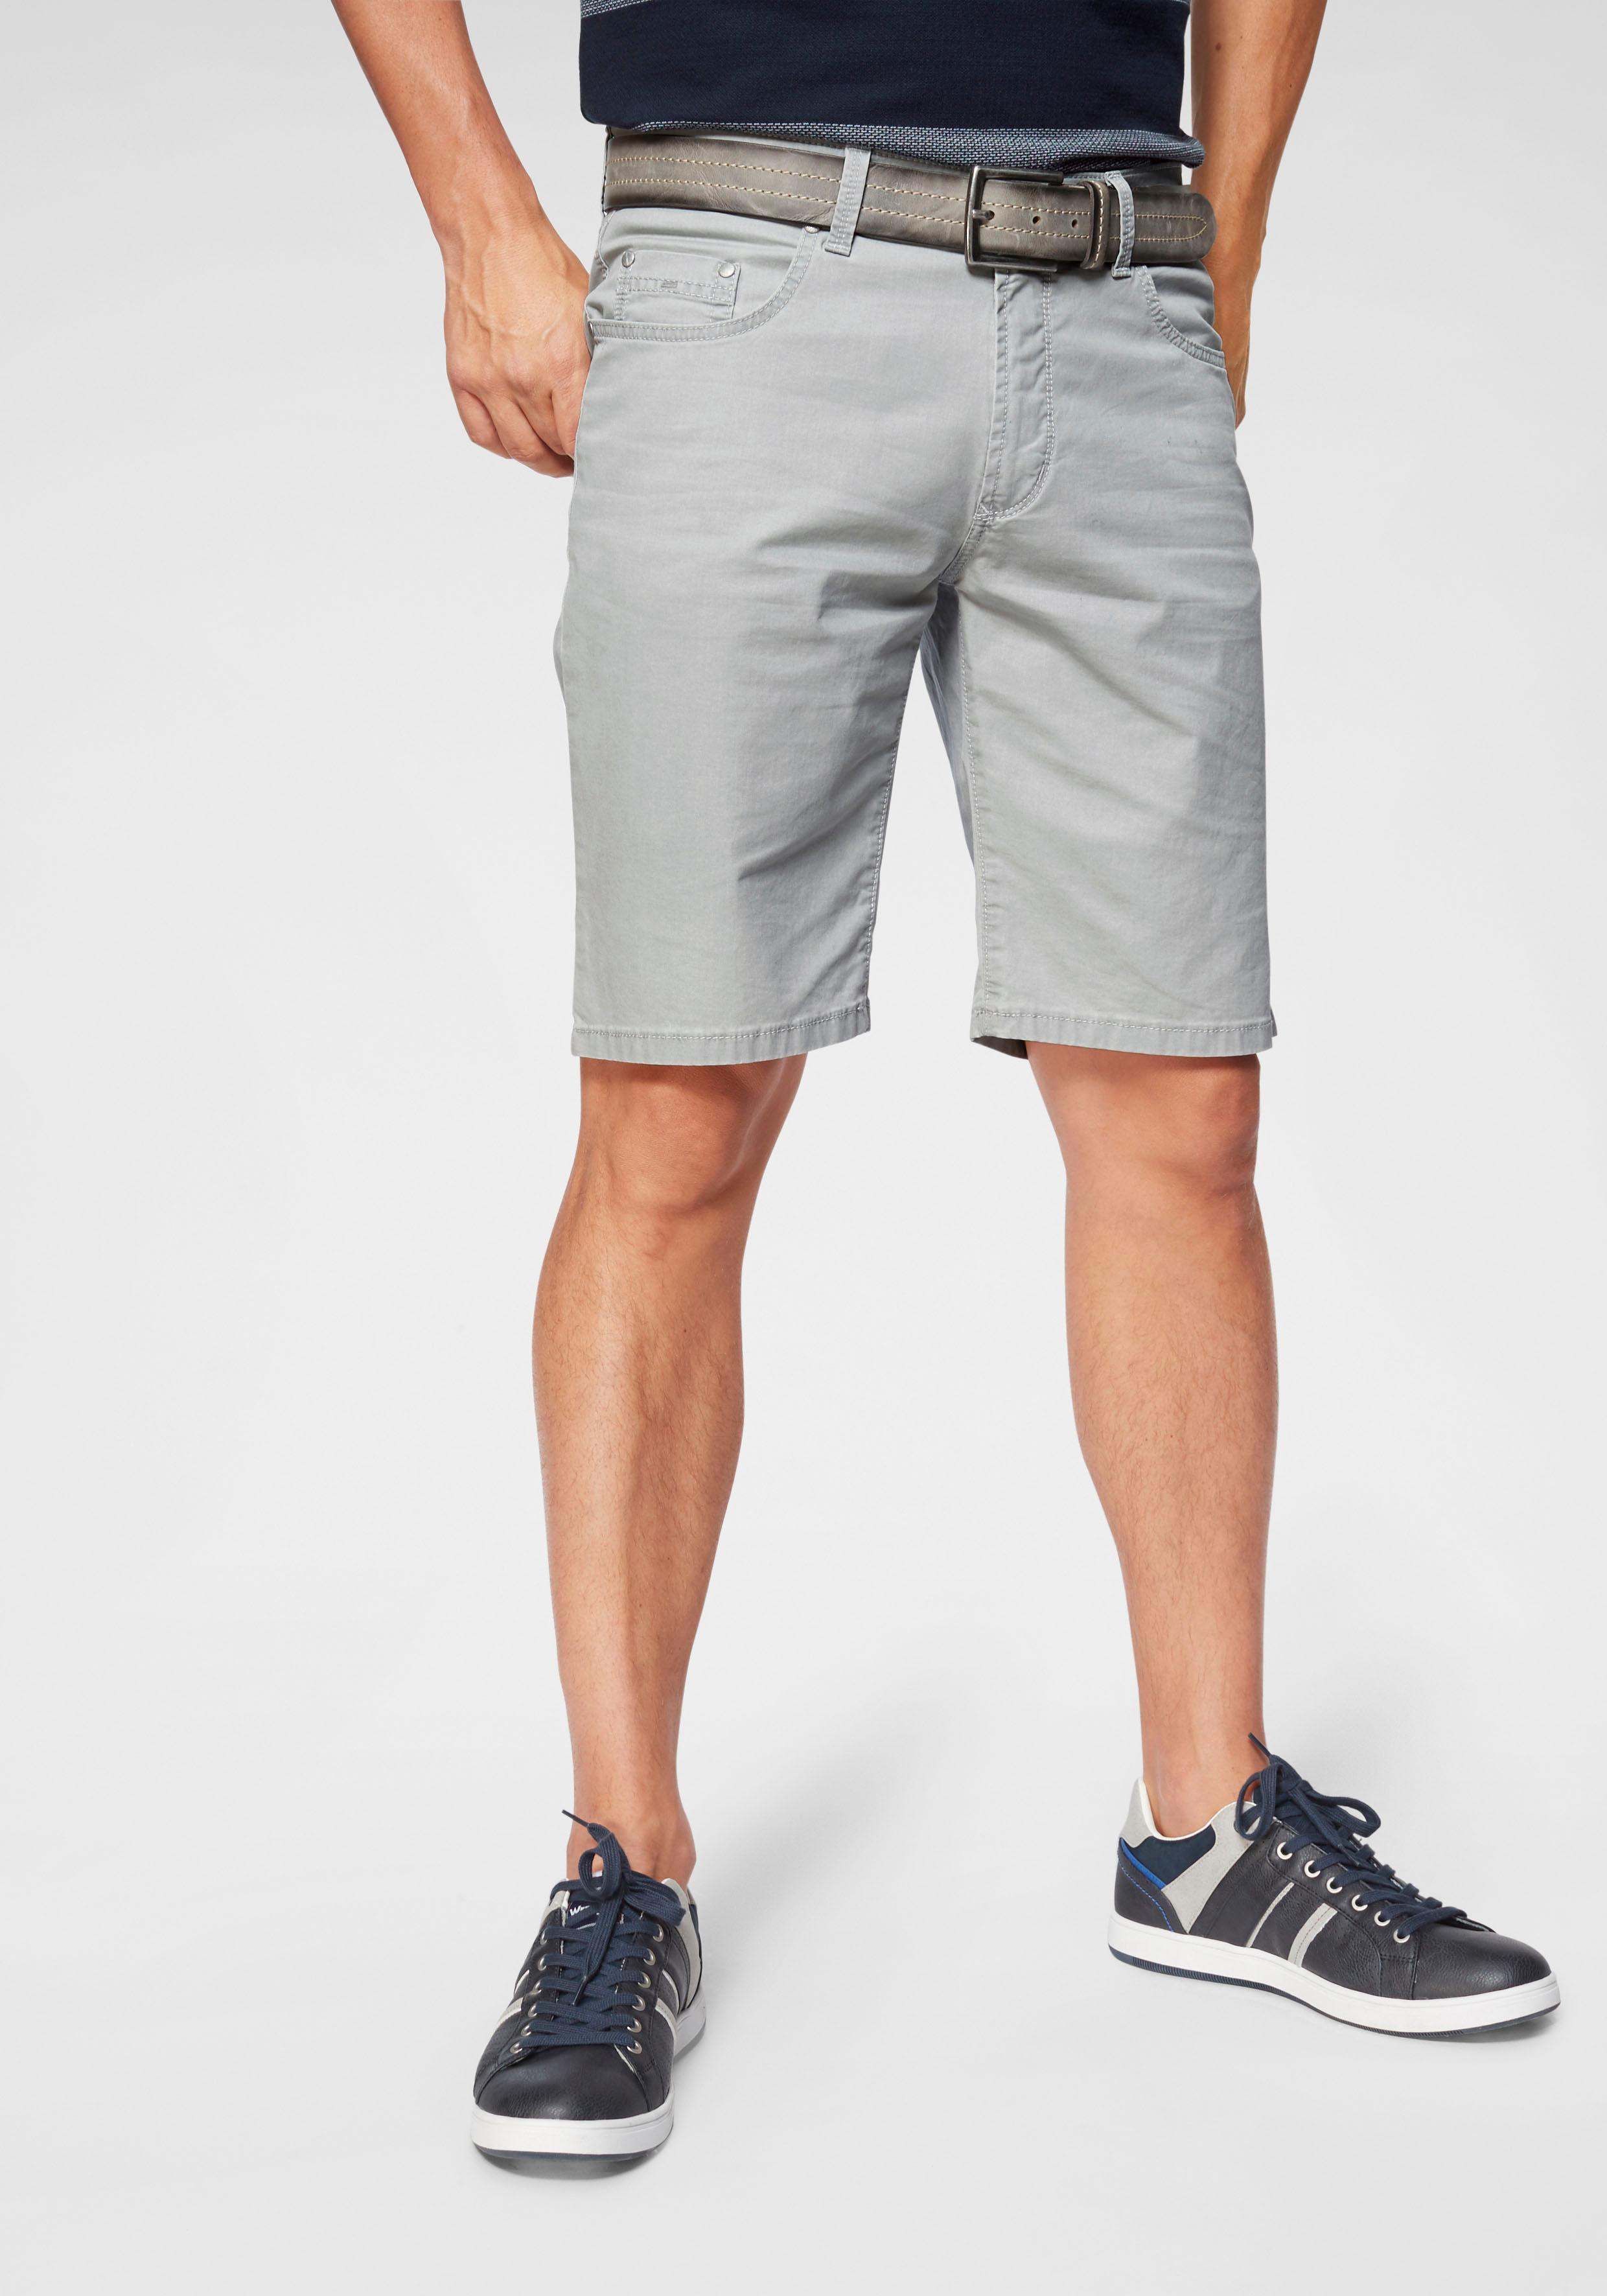 Pioneer Authentic Jeans Shorts | Bekleidung > Shorts & Bermudas > Shorts | Grau | Pioneer_Textil